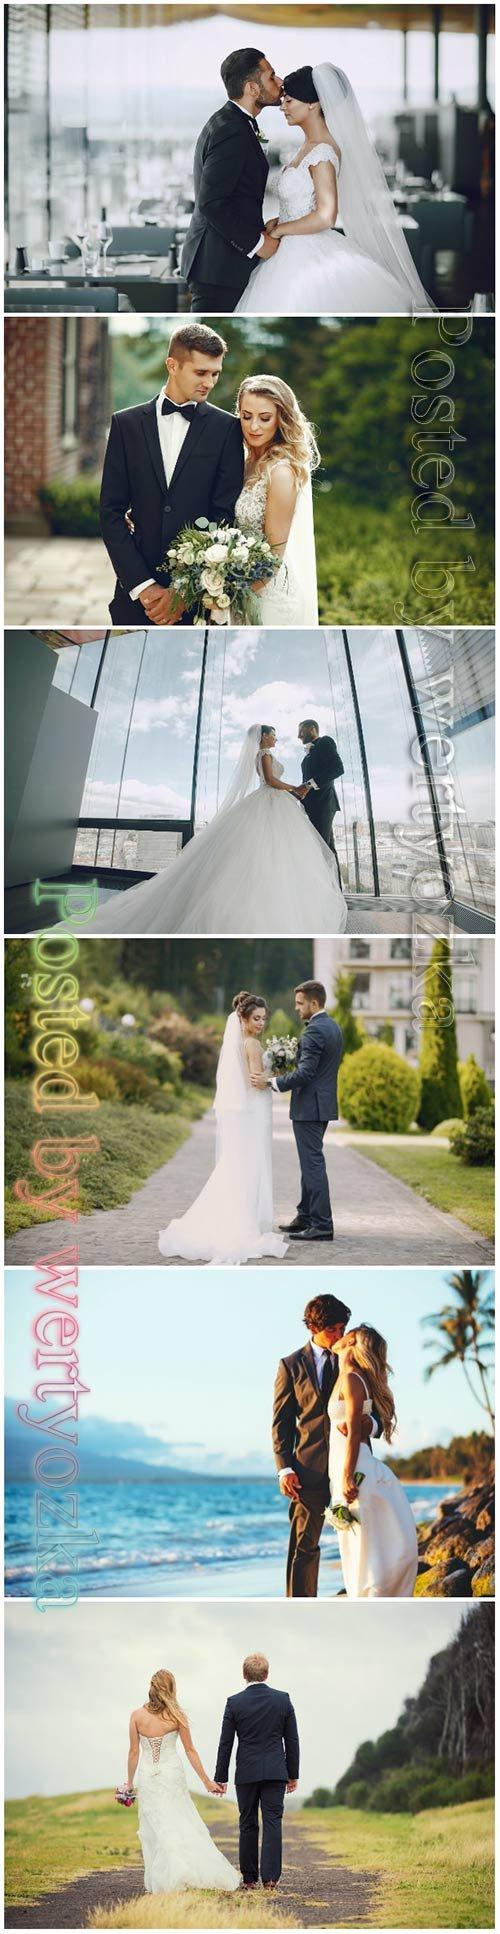 Elegant wedding beautiful stock photo